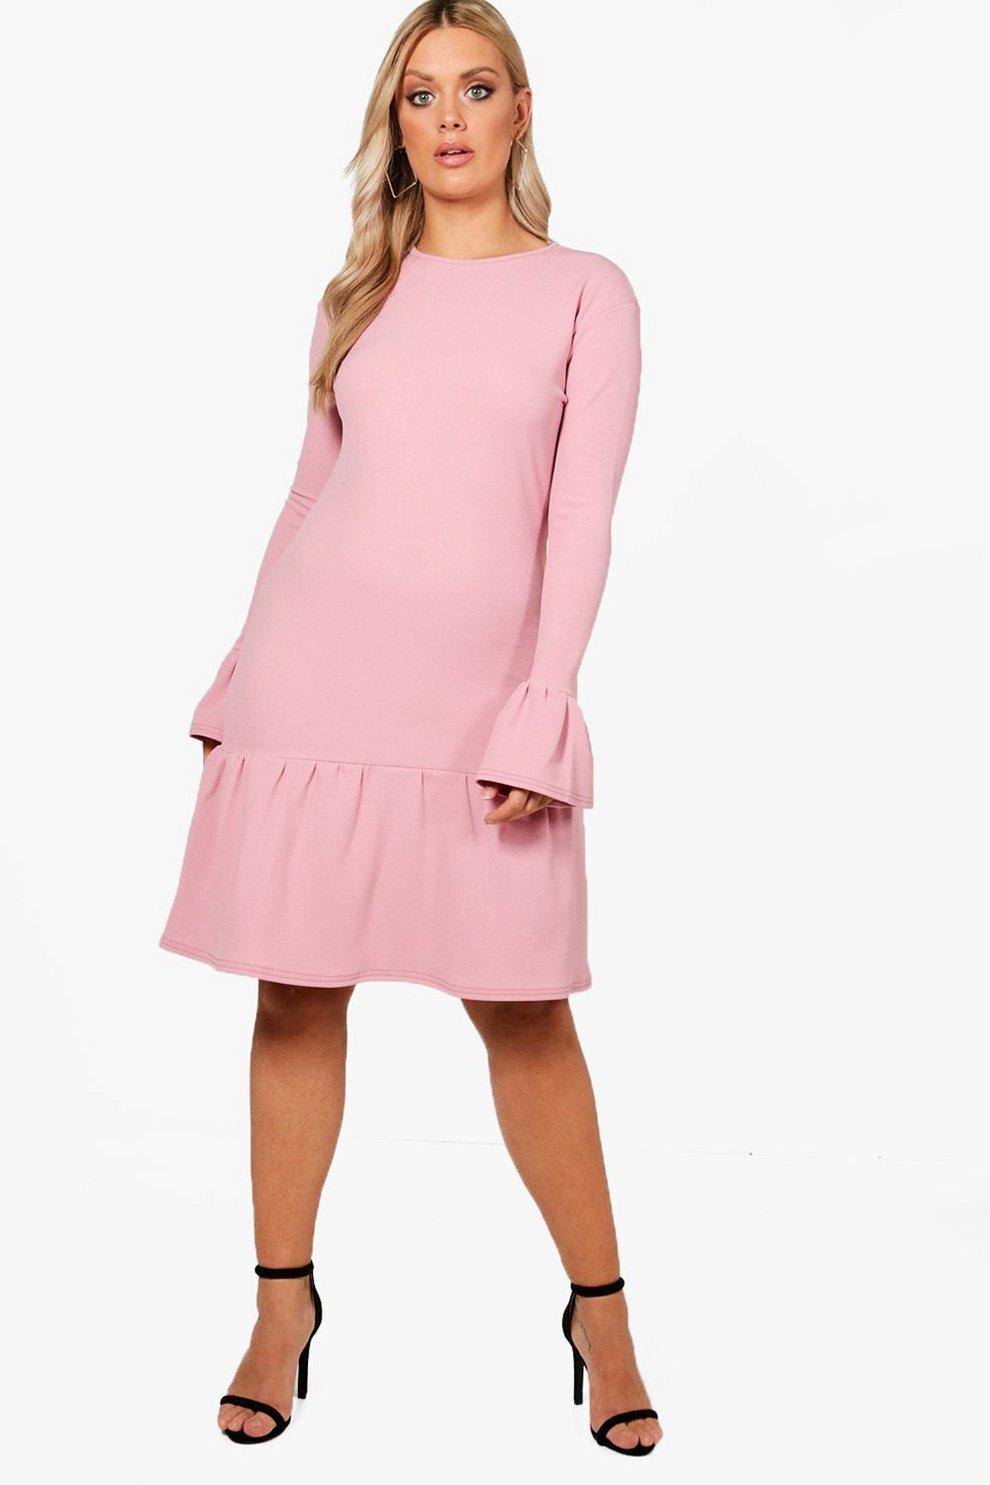 Good Selling Online Choice Boohoo Plus Peplum Hem Dress pmTUx1snY